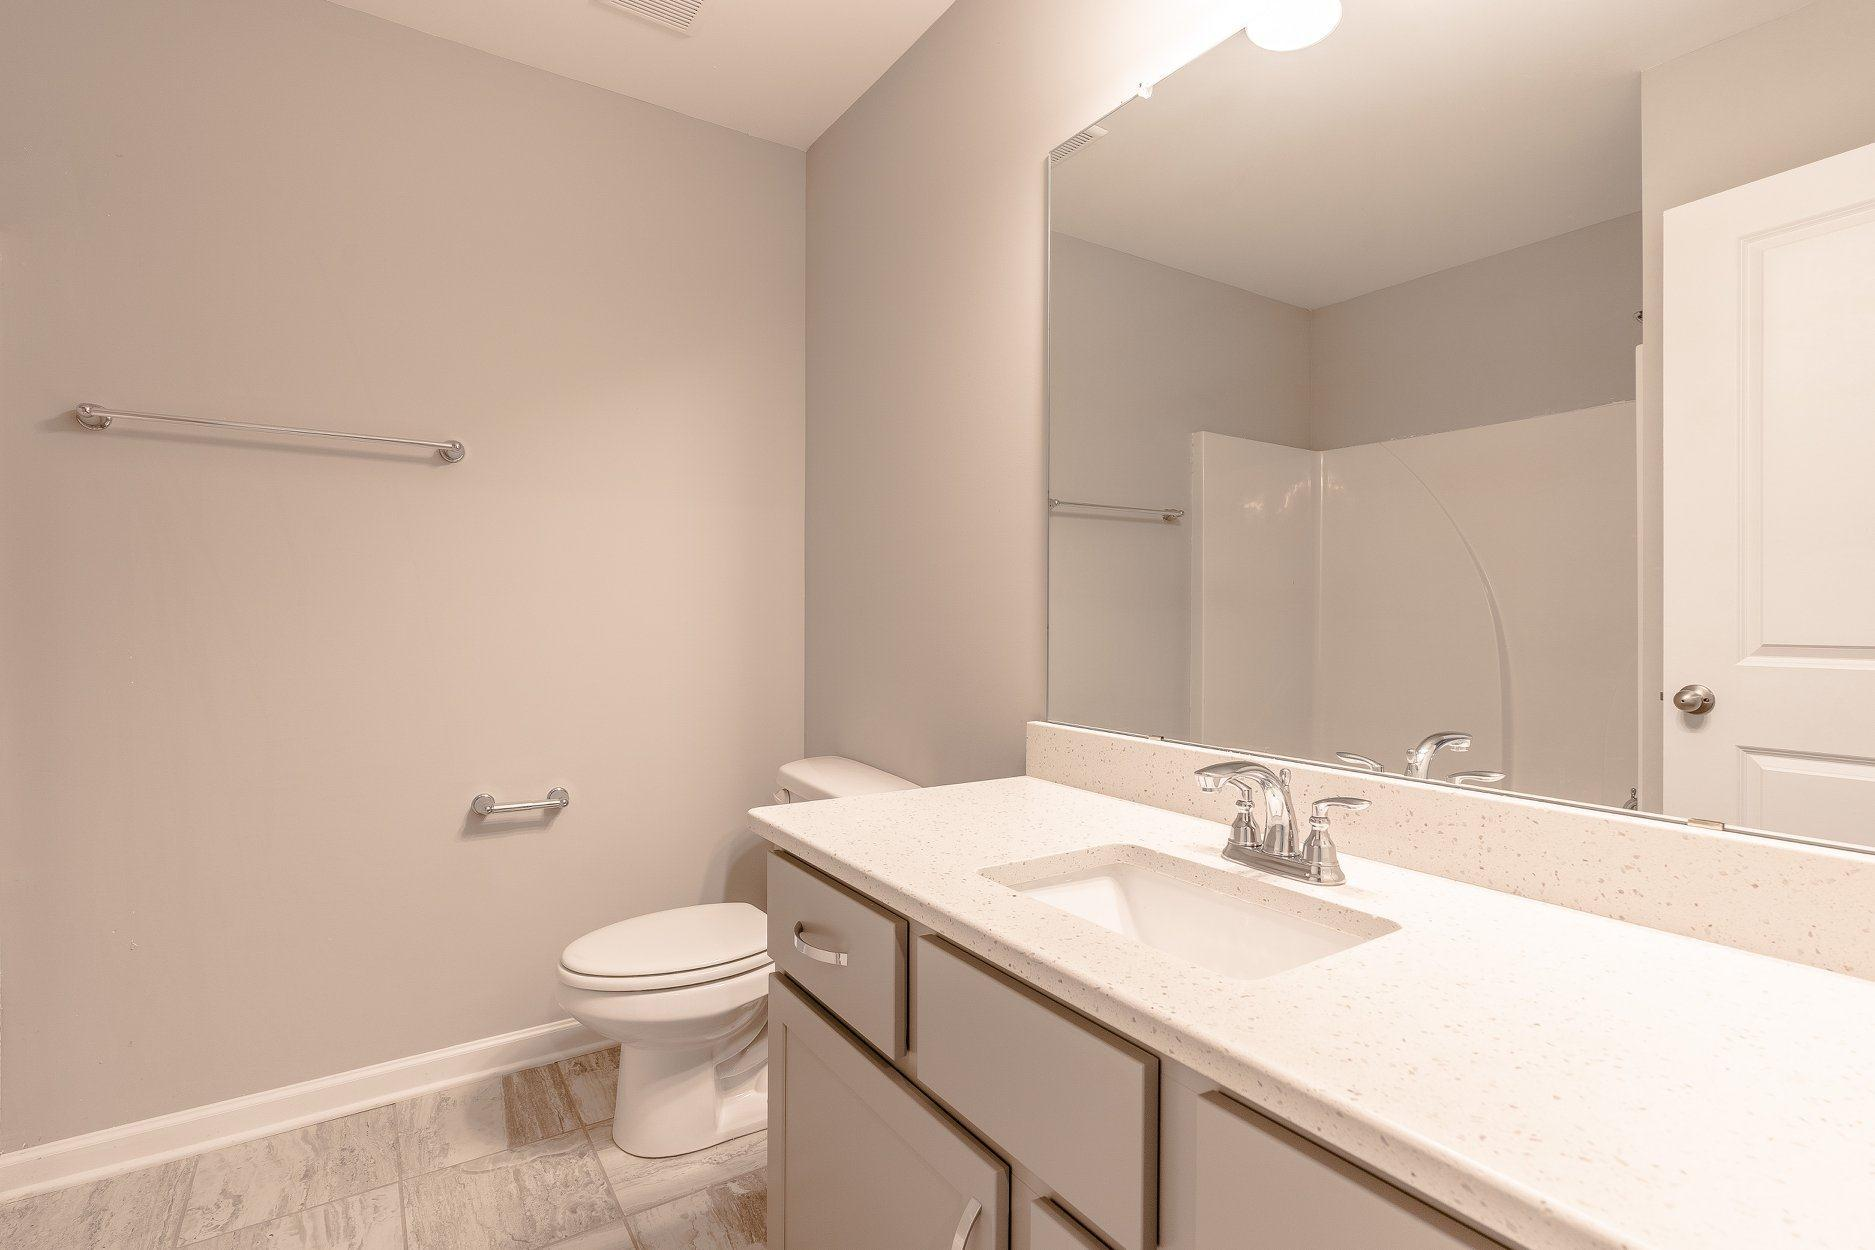 Bathroom featured in the Cannaberra By Hughston Homes in Auburn-Opelika, AL